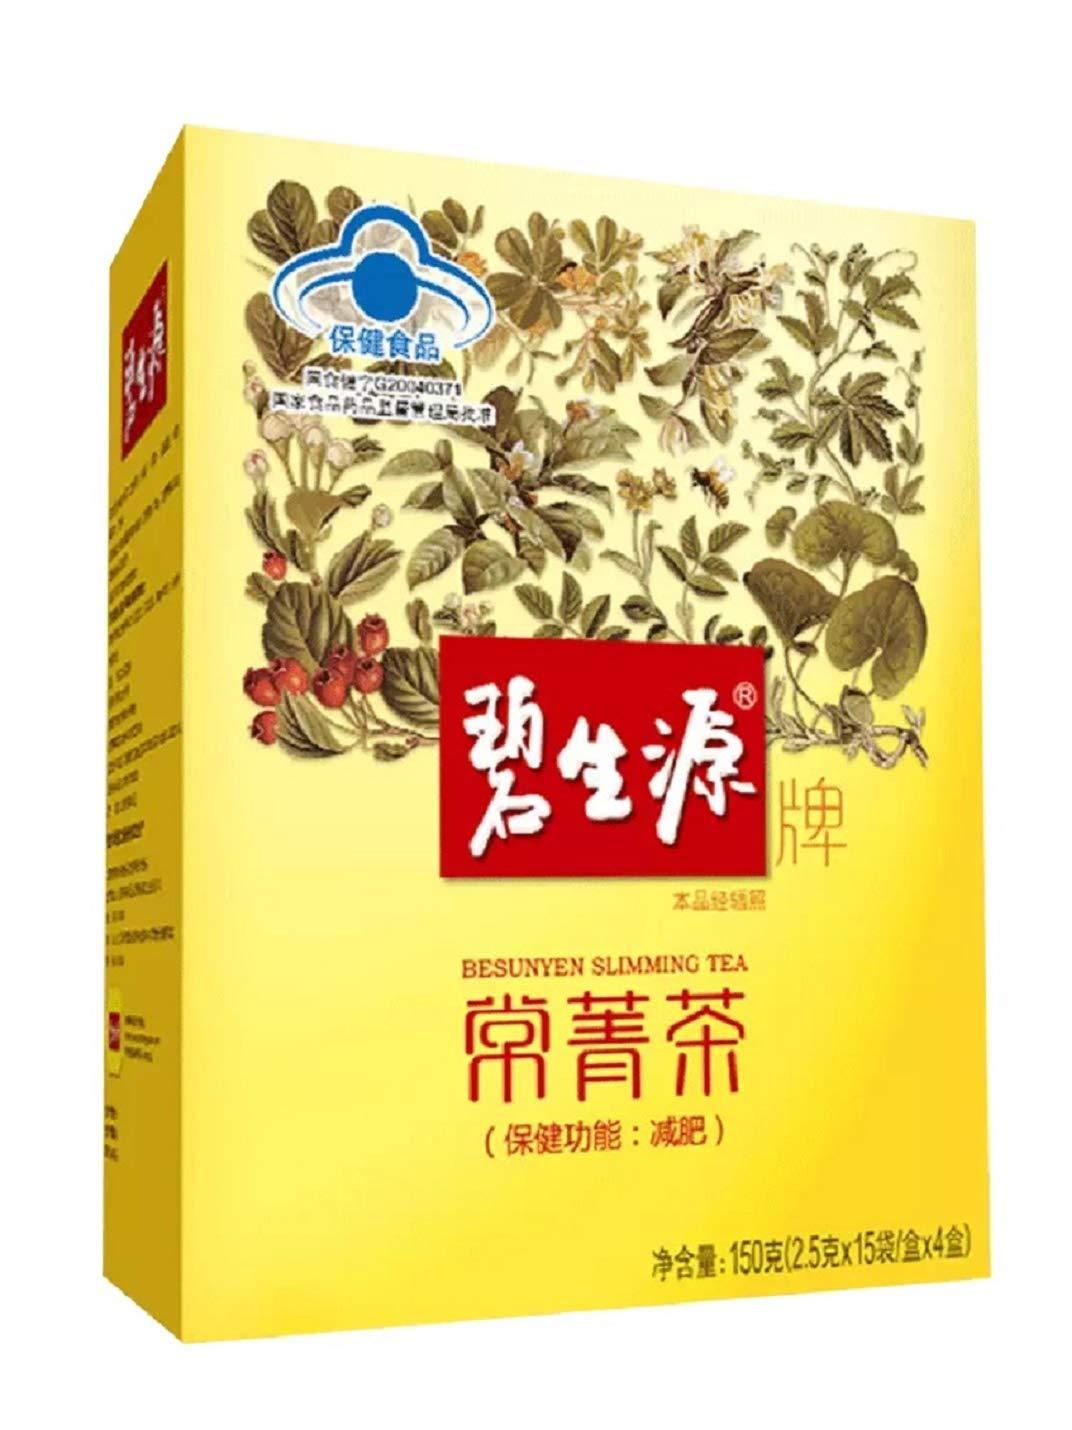 BESUNYEN Slimming TEA(碧生源常菁茶 150g 60bags)for Beauty & Keeping Figure